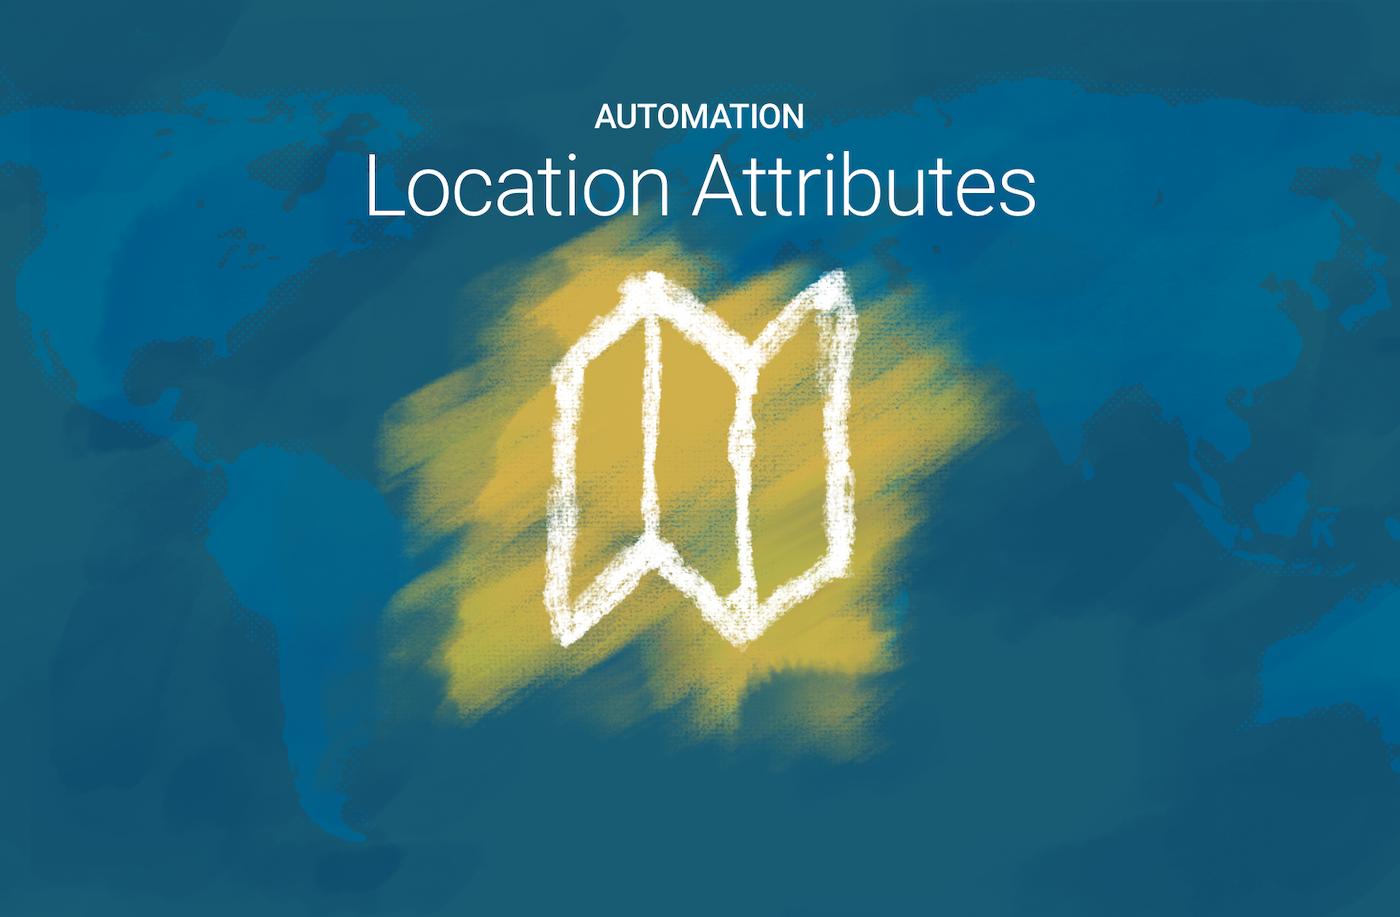 UI Support for Location (Region) Attributes